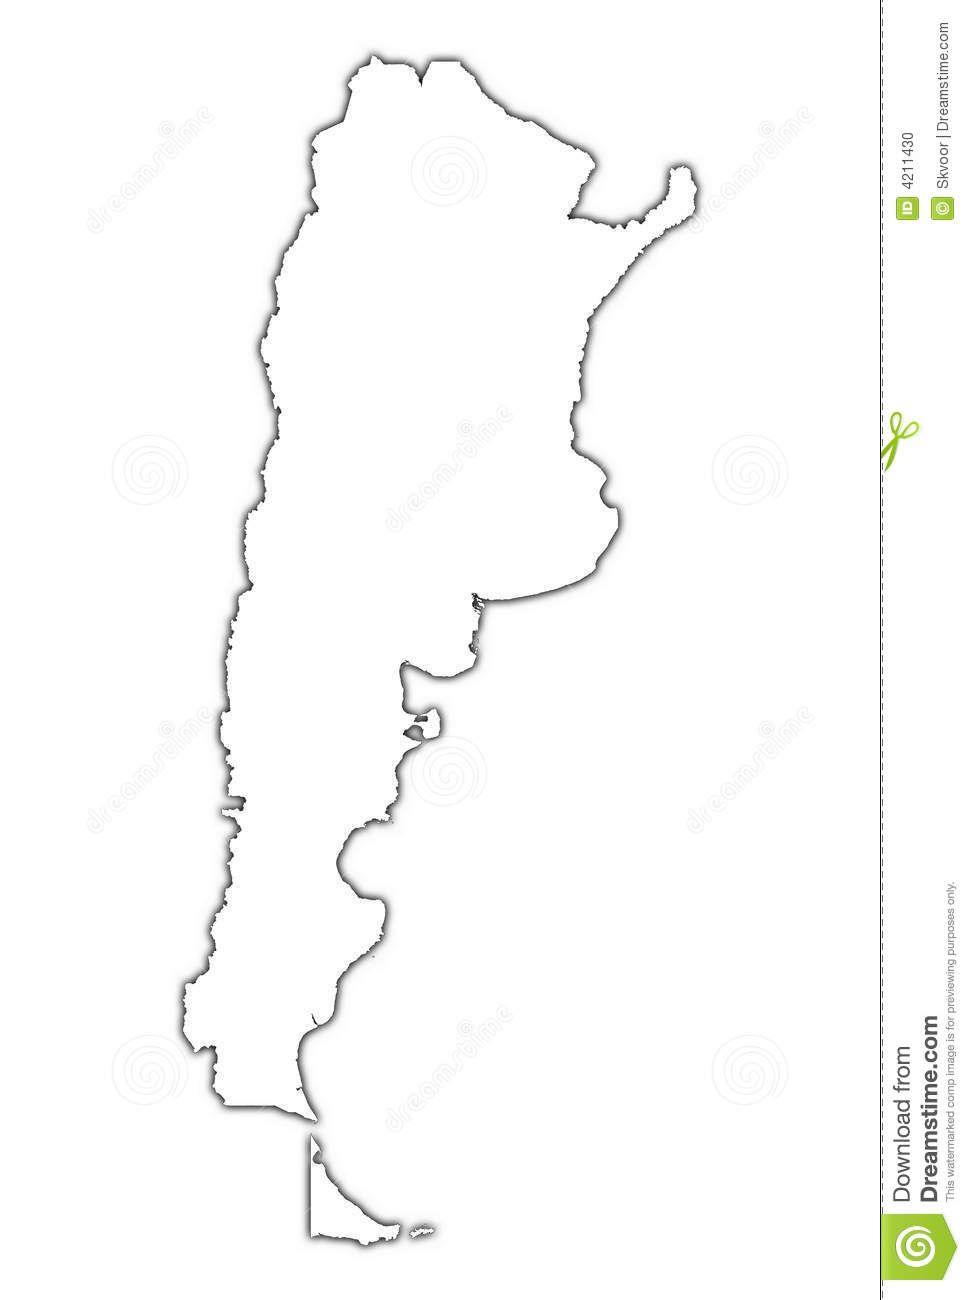 Argentina Map Outline Google Search Evita Pinterest - Argentina map outline